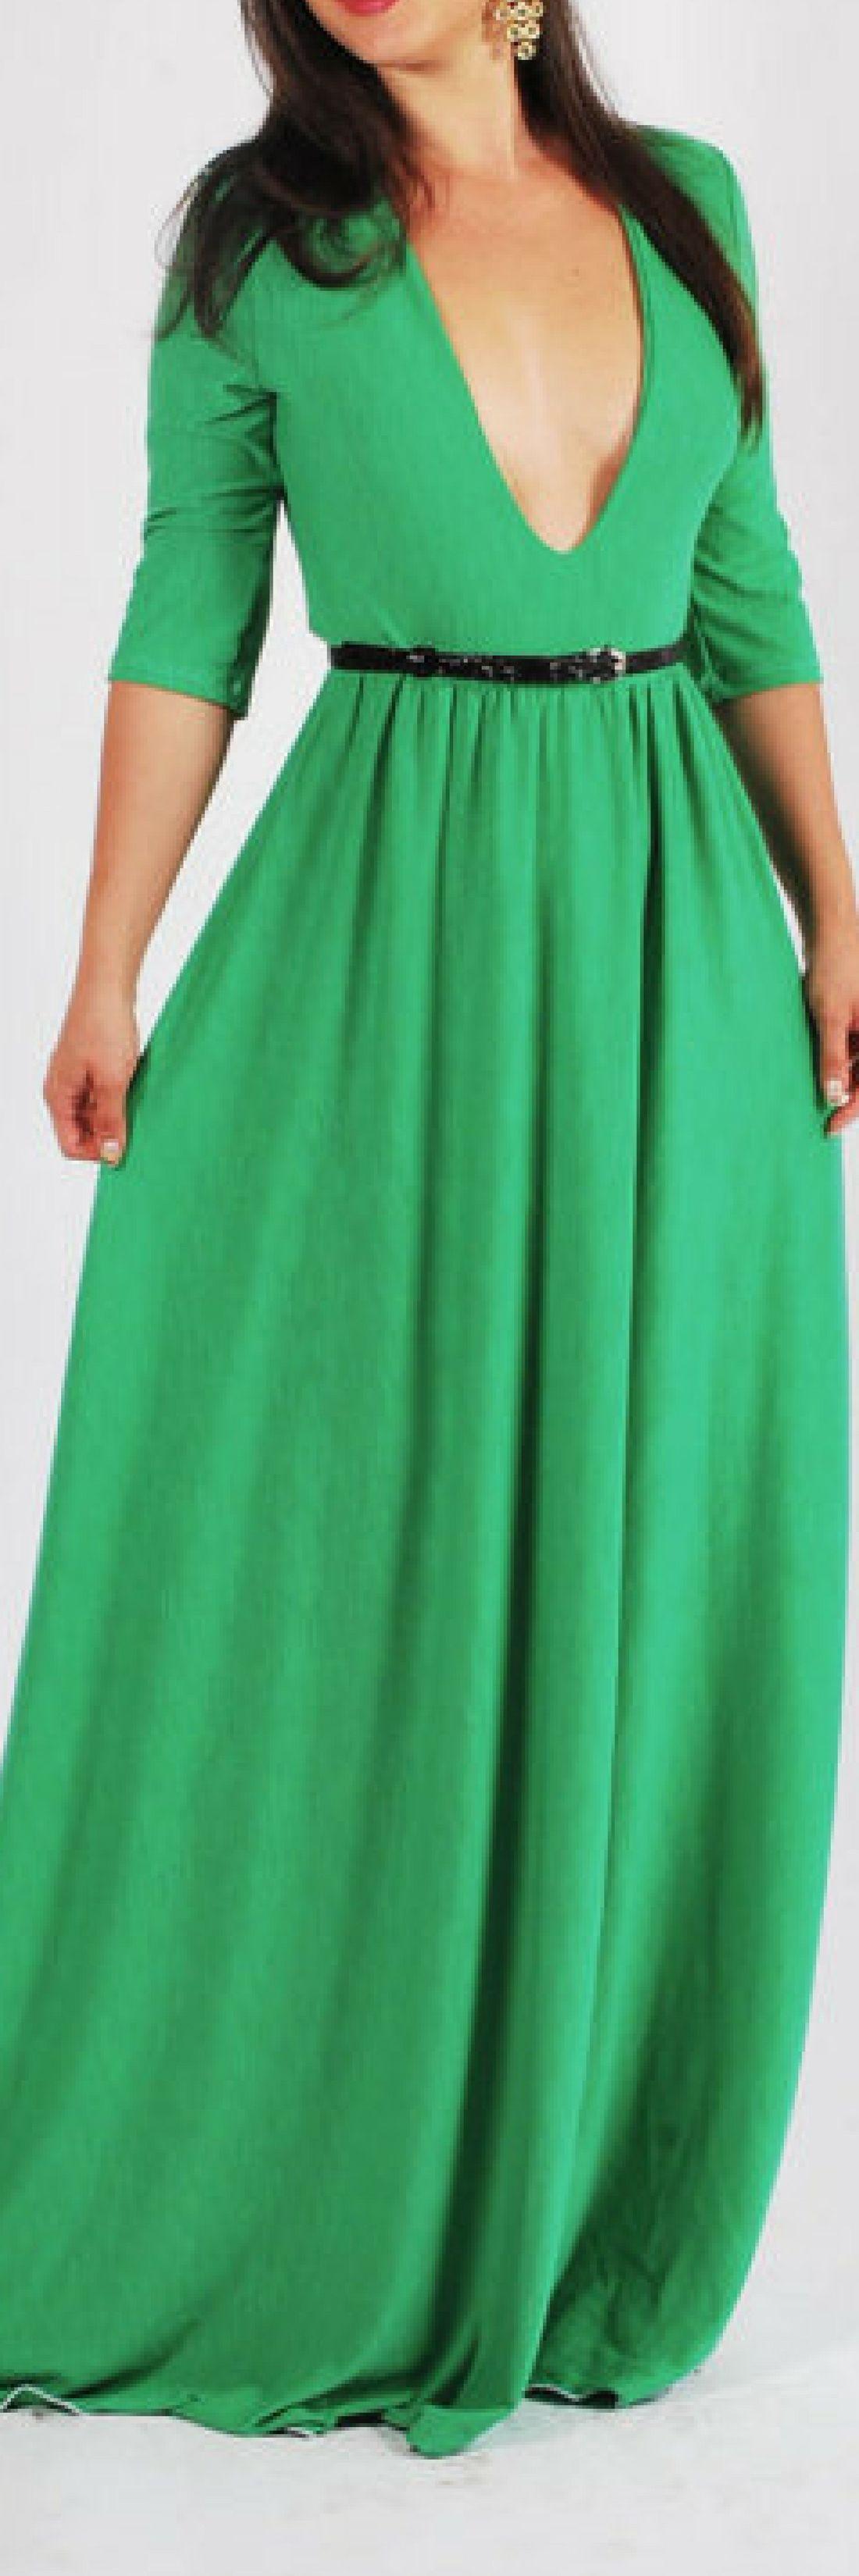 Green deep v neck printed lycra maxi dress maxi summer dress quarter